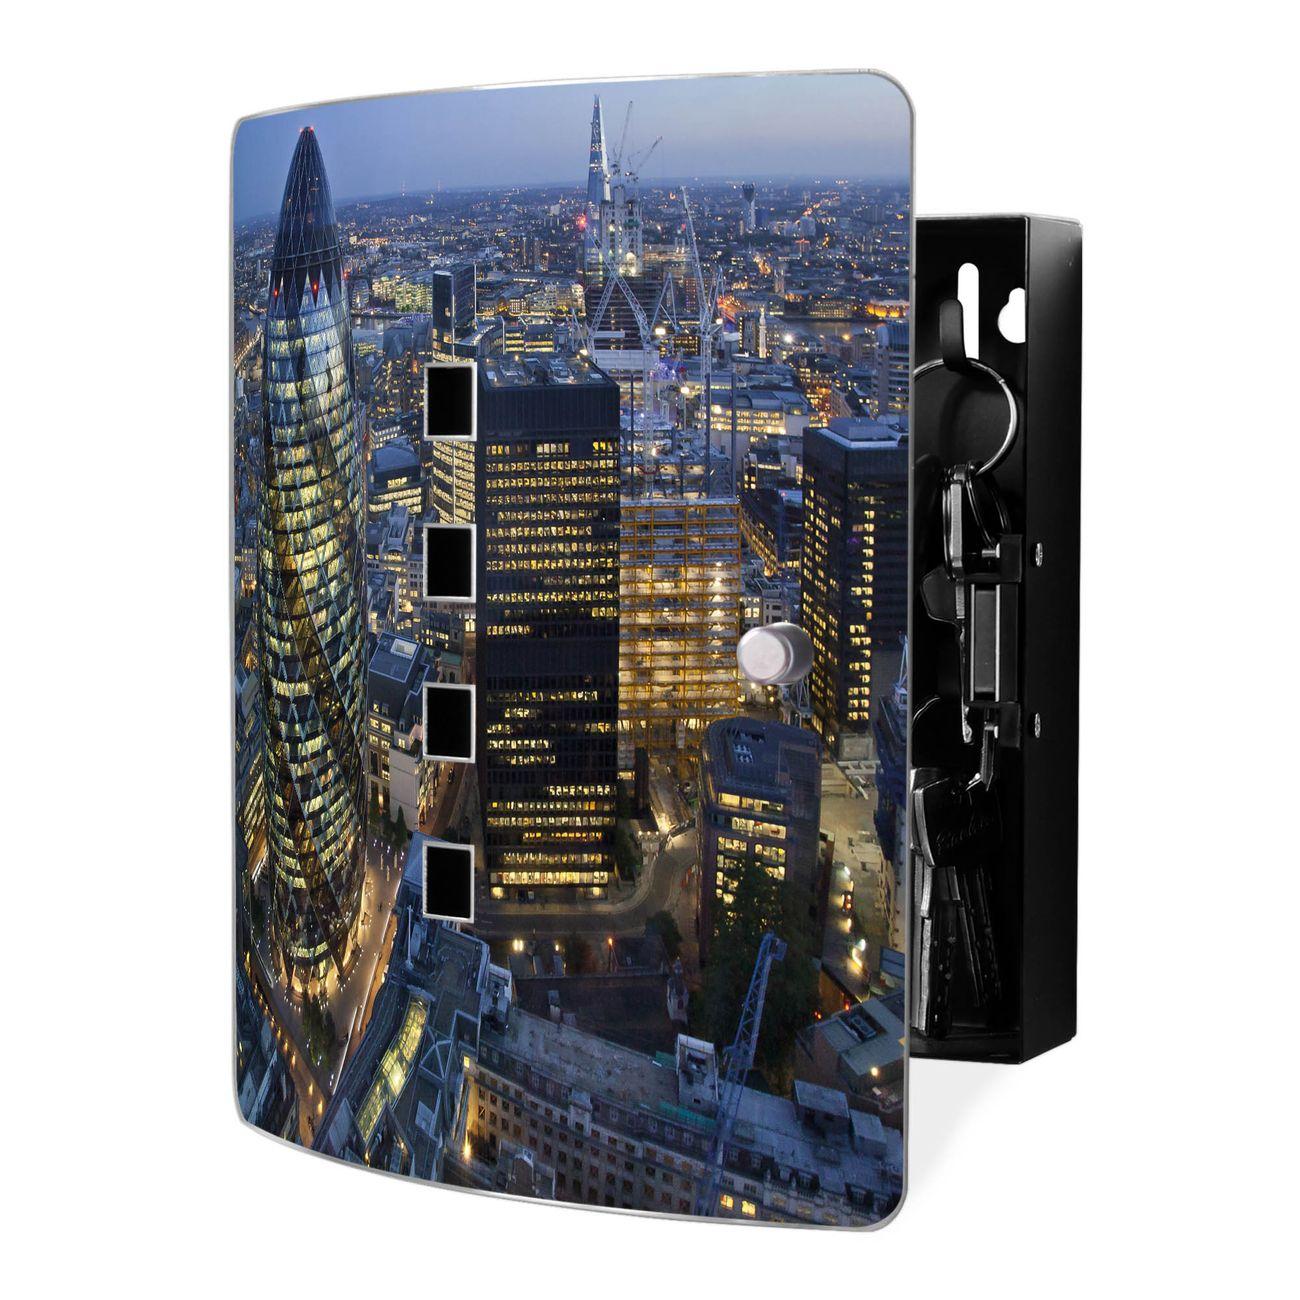 Schlüsselkasten Motiv City Of London